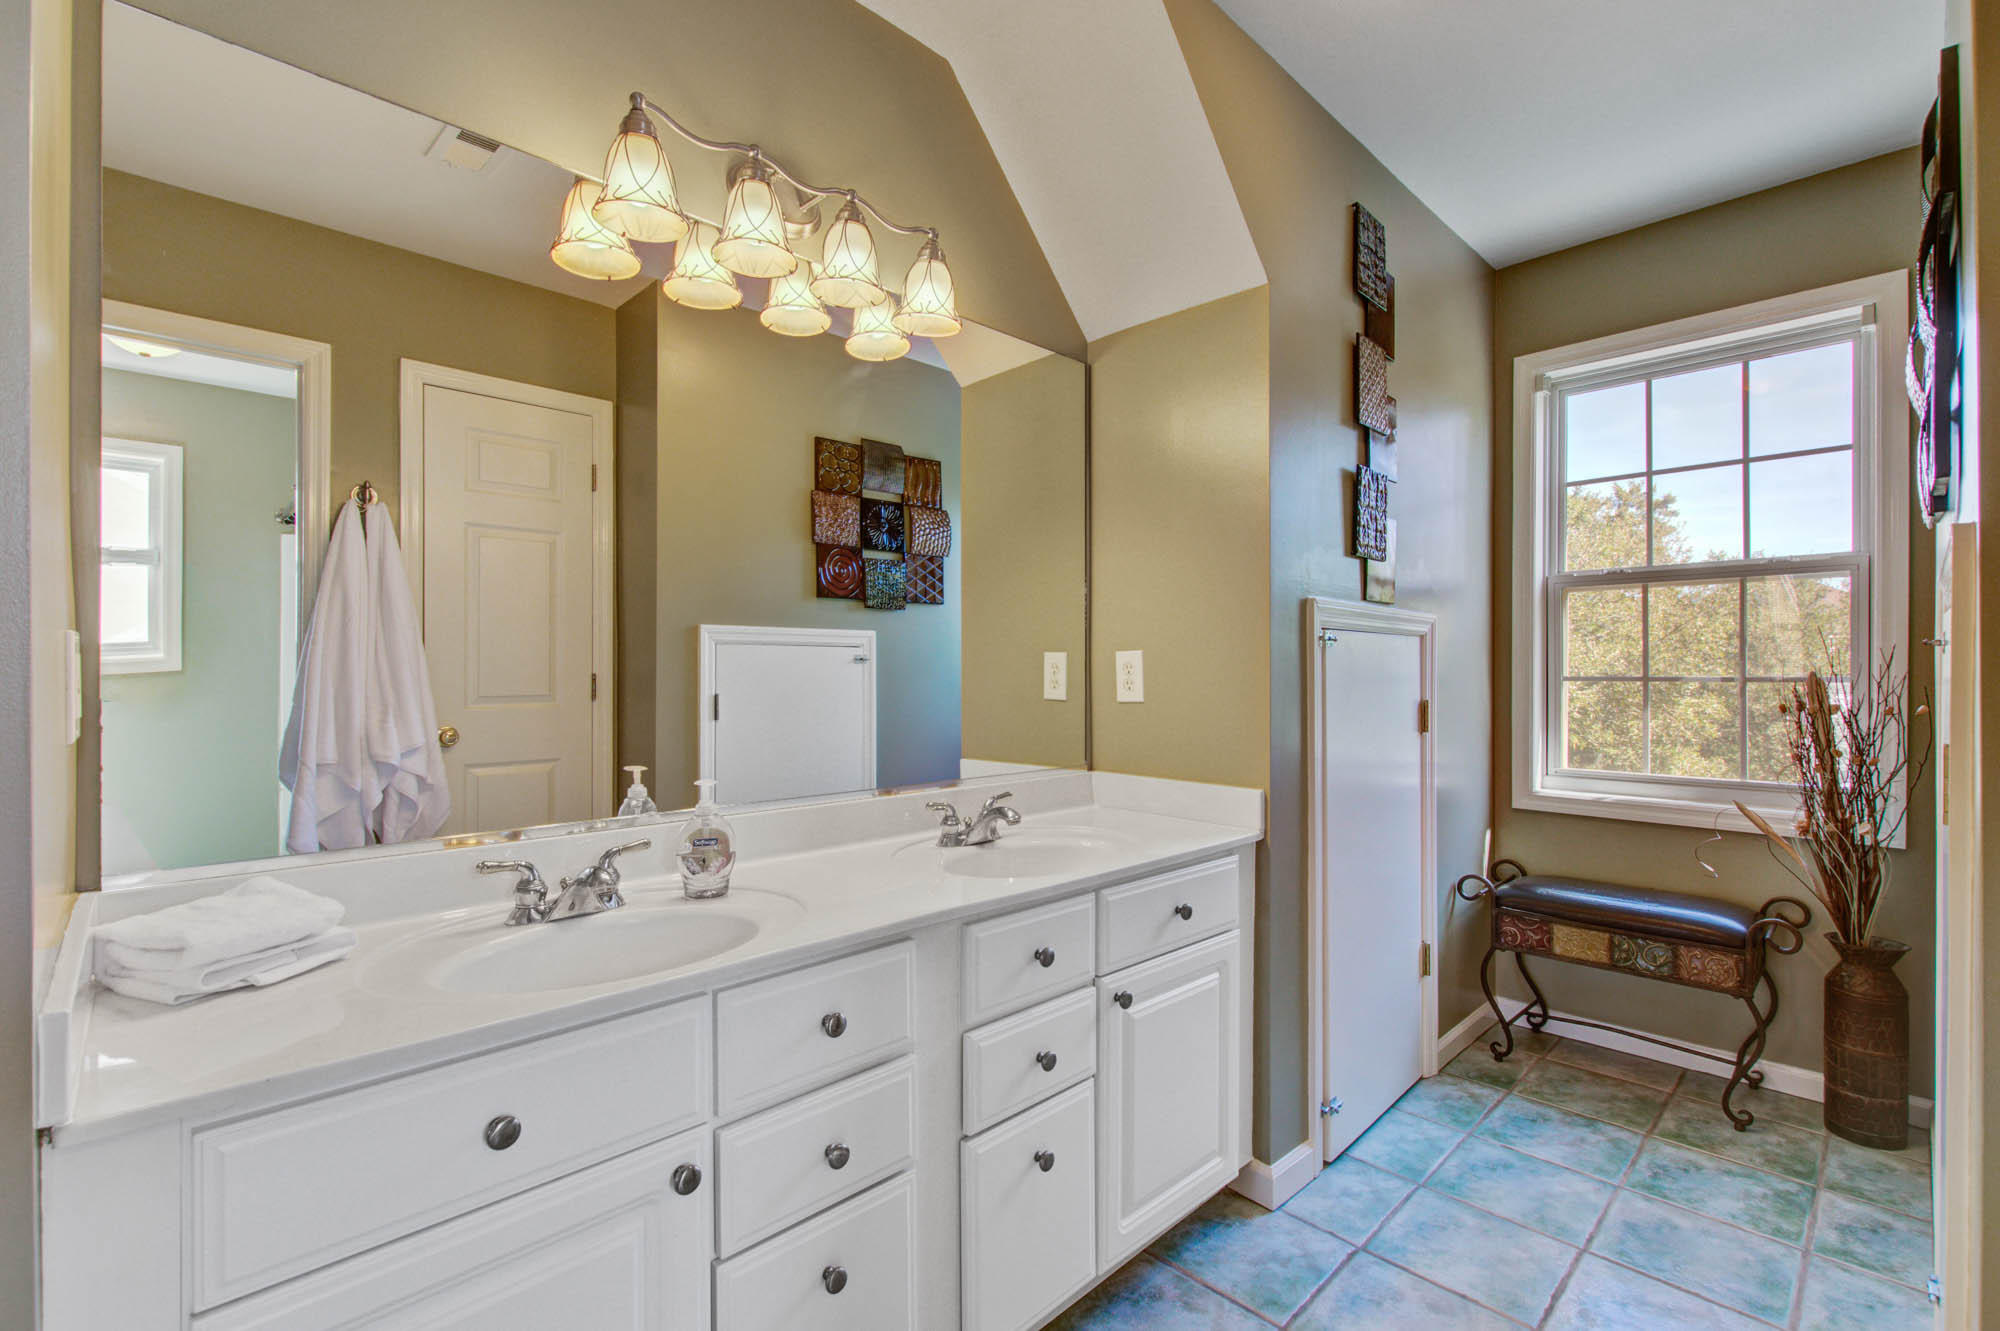 St Thomas Point Homes For Sale - 307 Jamesbury, Charleston, SC - 17